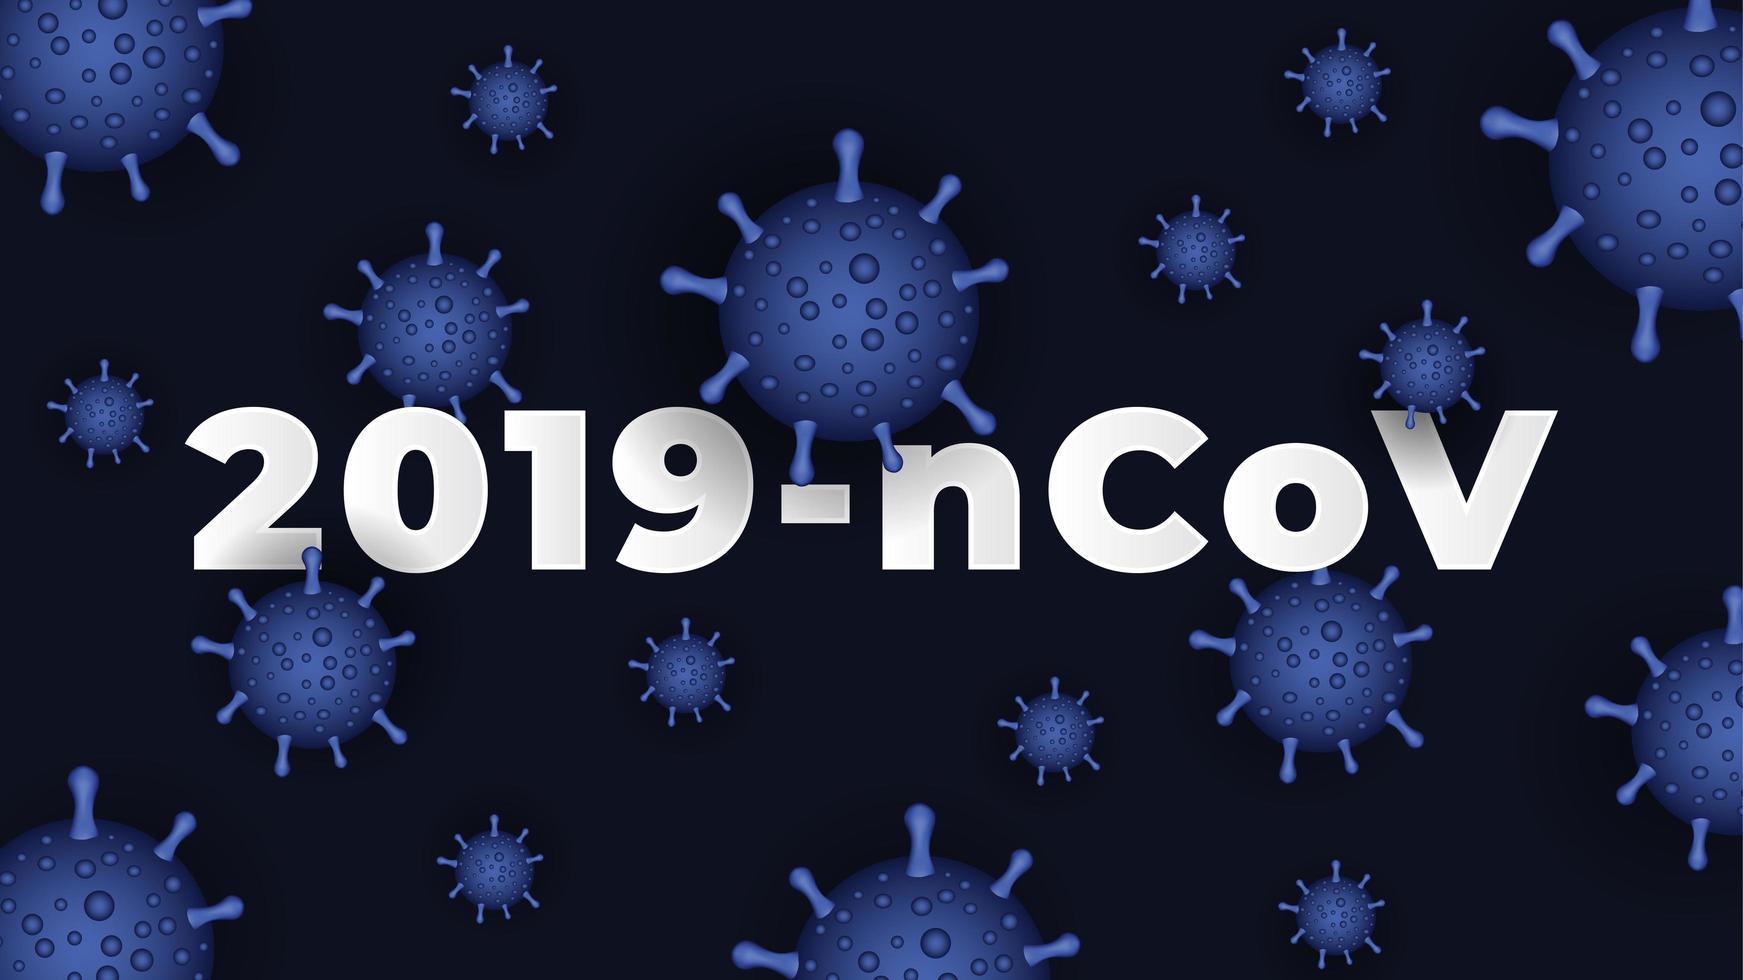 Fondo azul coronavirus covid-19 vector